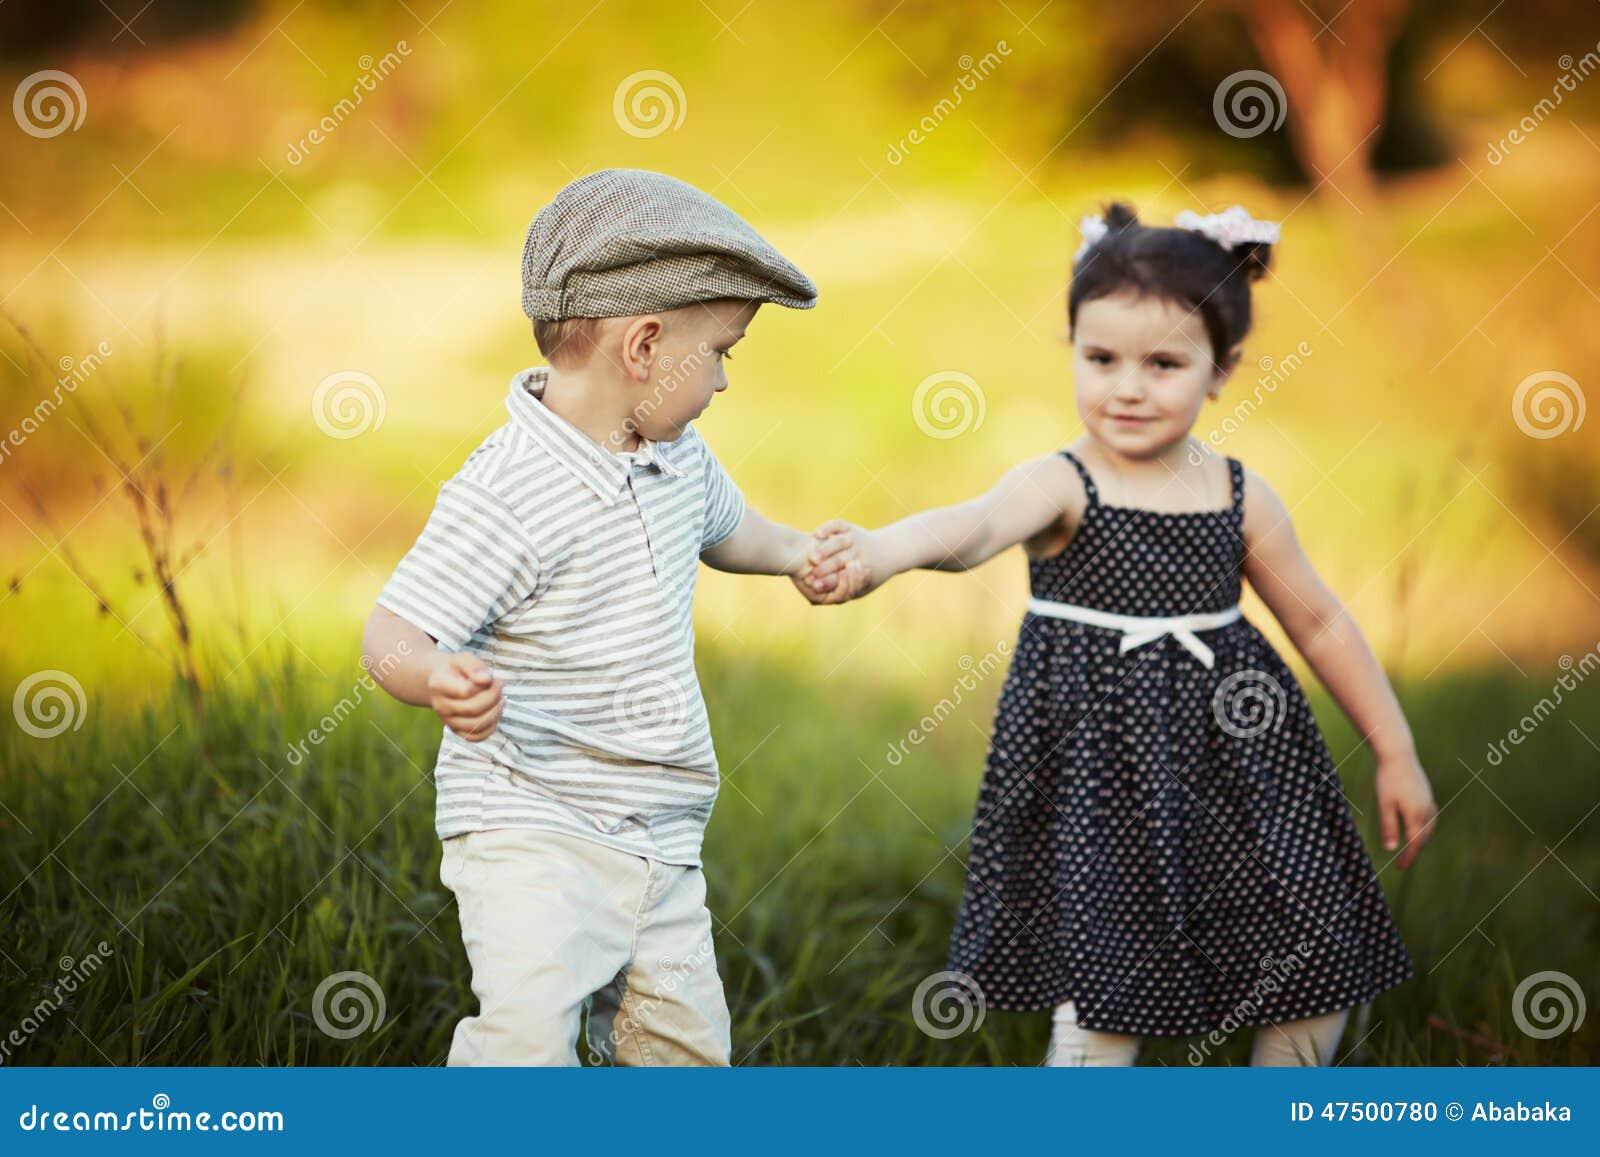 cute boy and girl on summer stock photo - image of face, garden